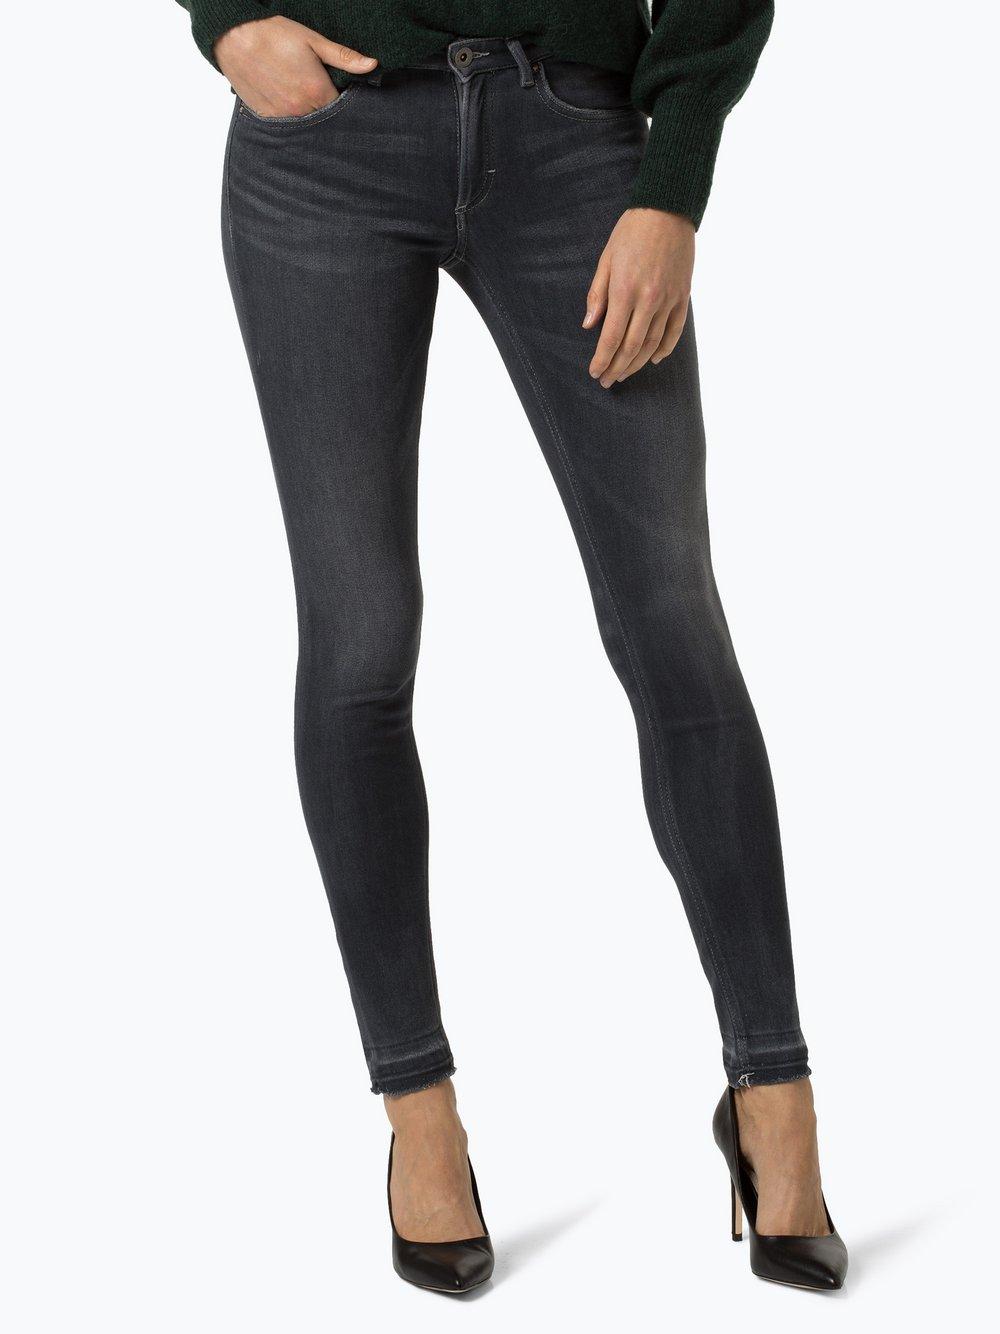 6959c55f59 Marc O'Polo Damen Jeans - Lulea online kaufen | PEEK-UND-CLOPPENBURG.DE